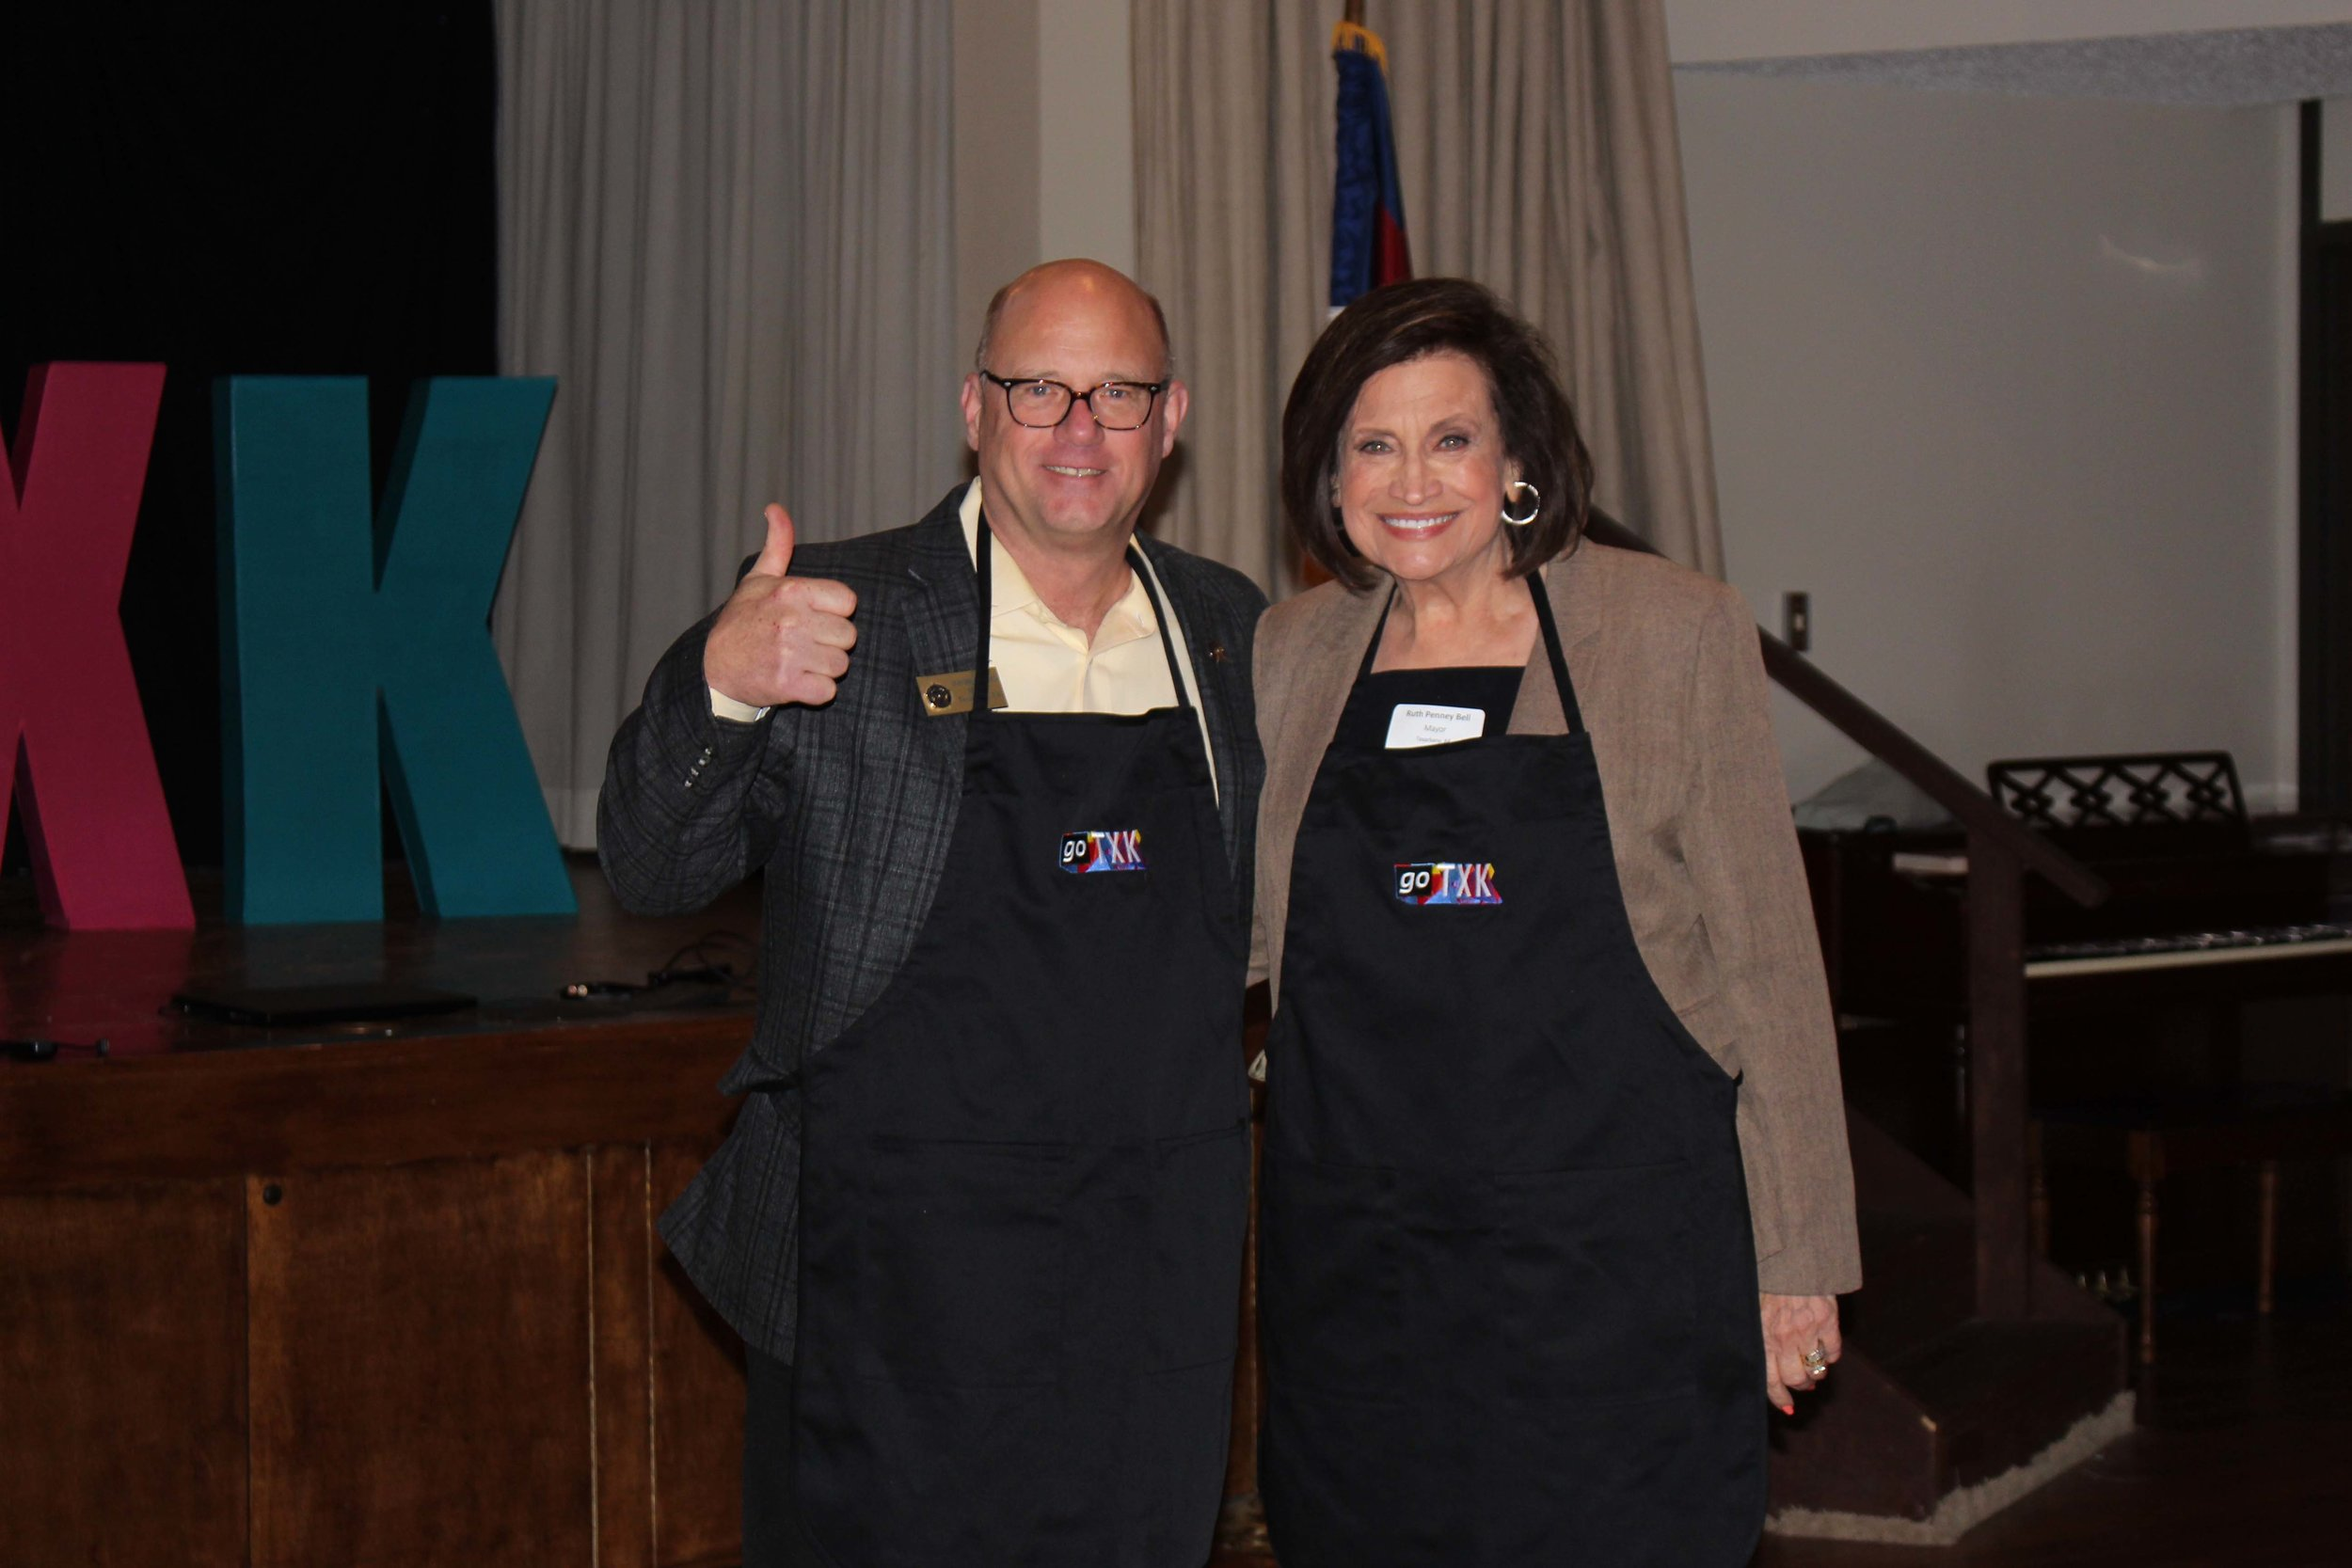 Mayor Bob Bruggeman and Ruth Penney Bell